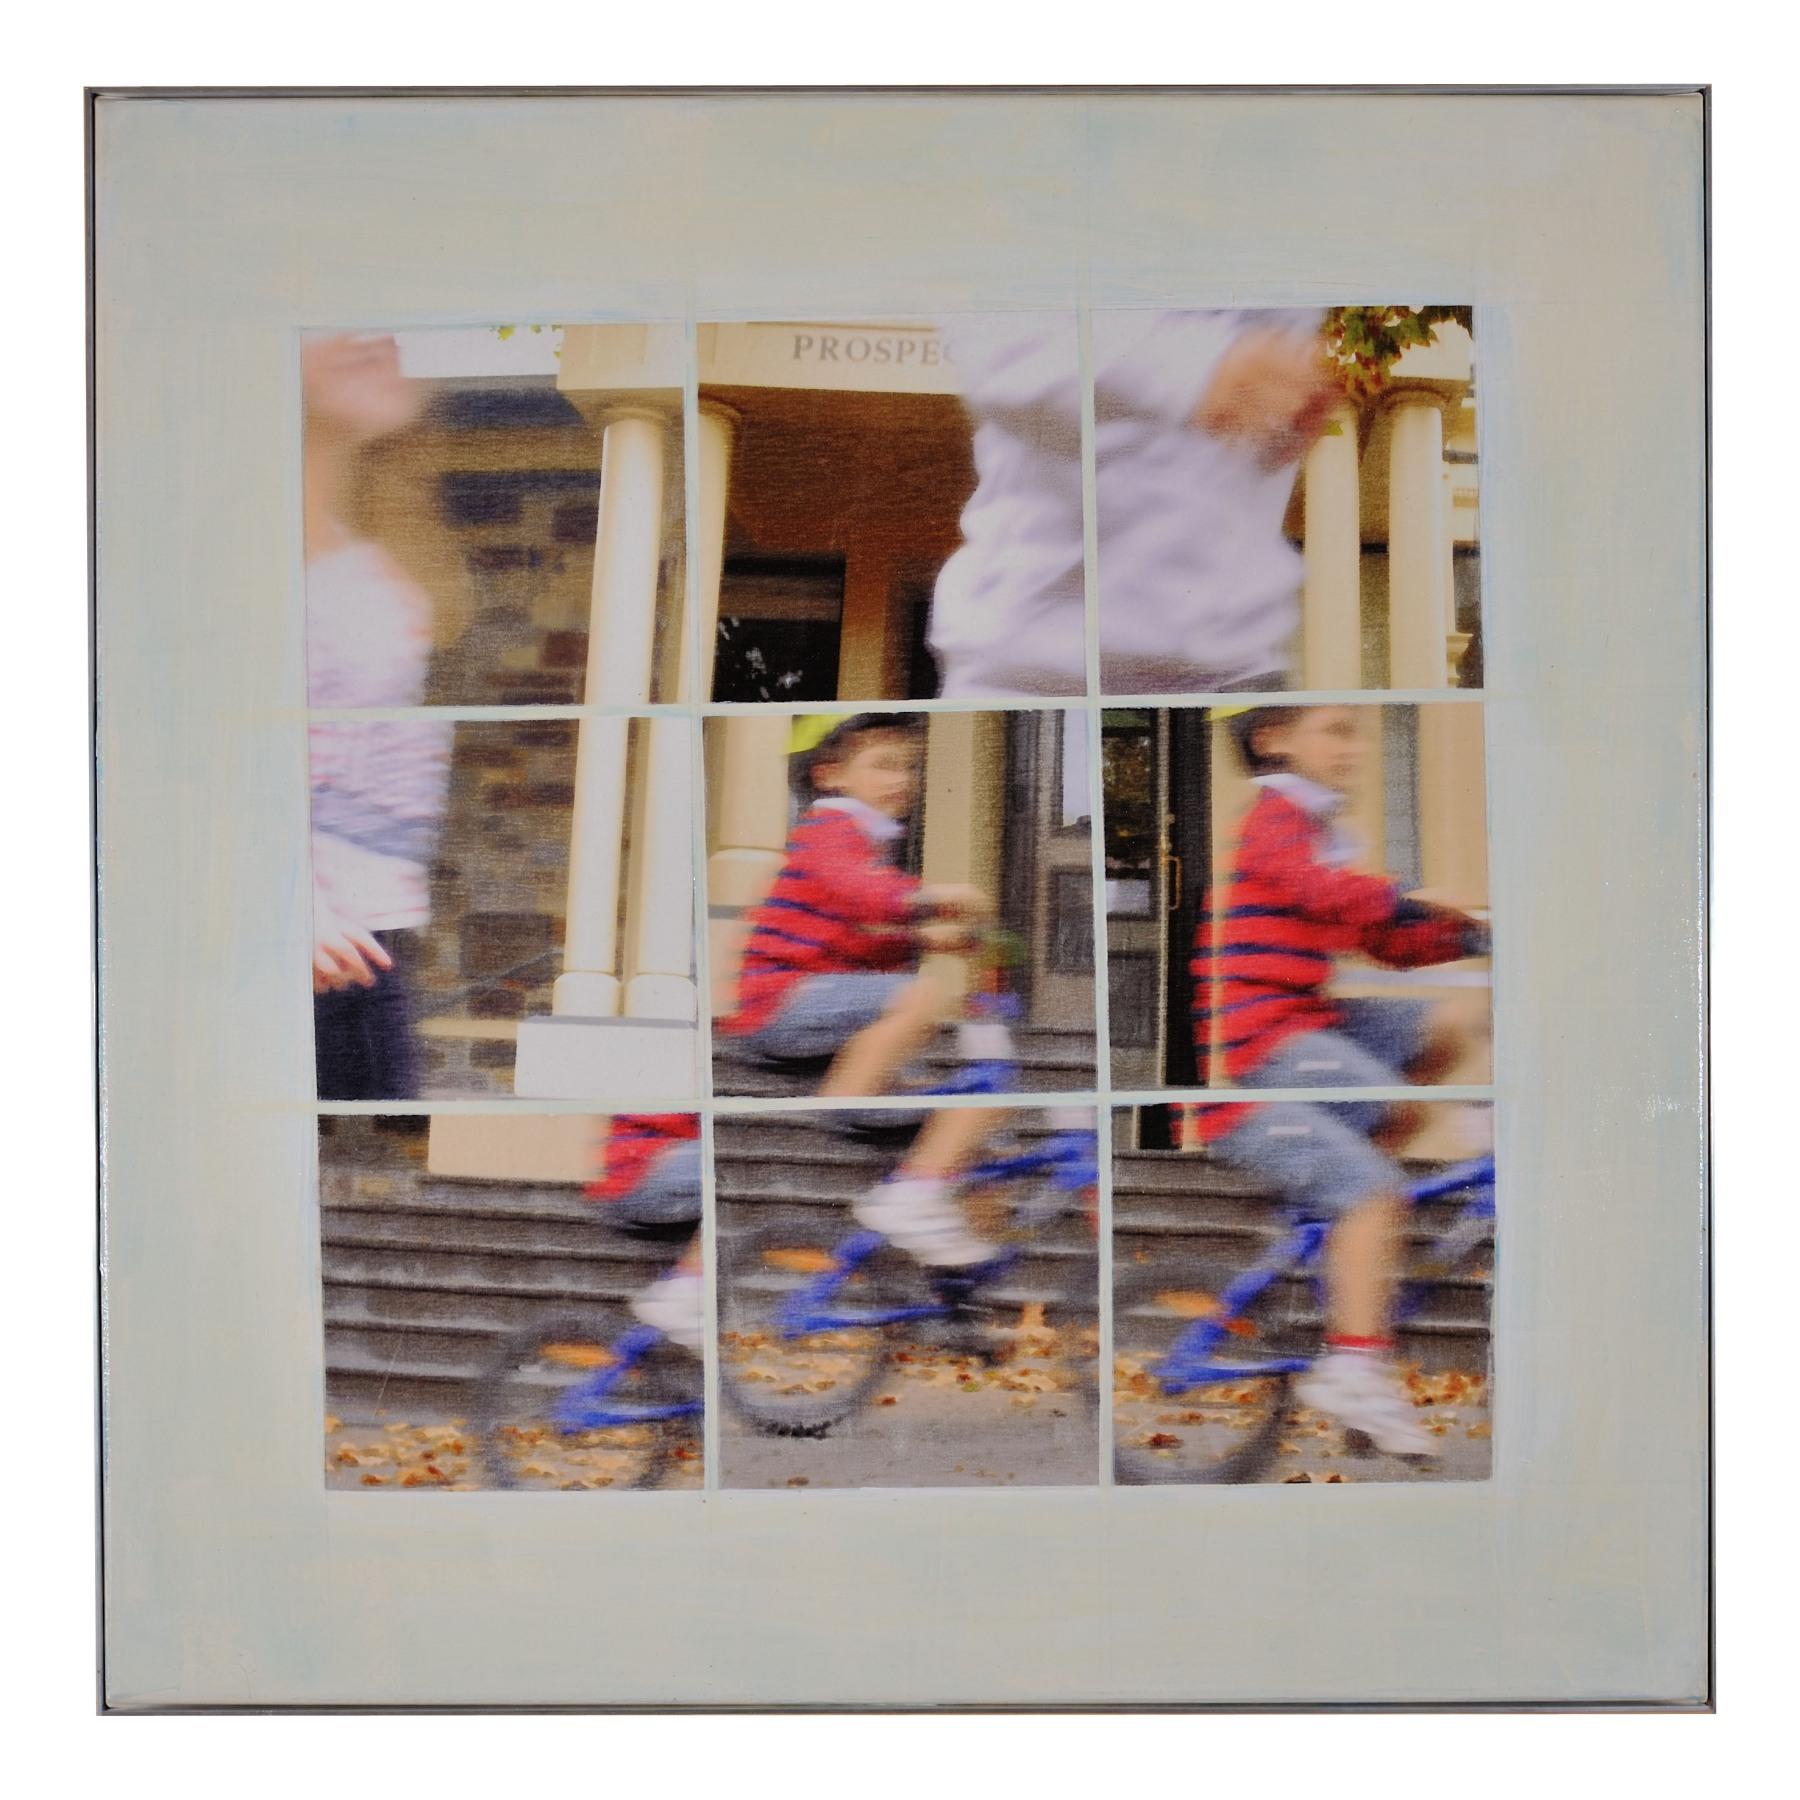 Prospect #2 - mixed media on canvas 90cm x 90cm 2013